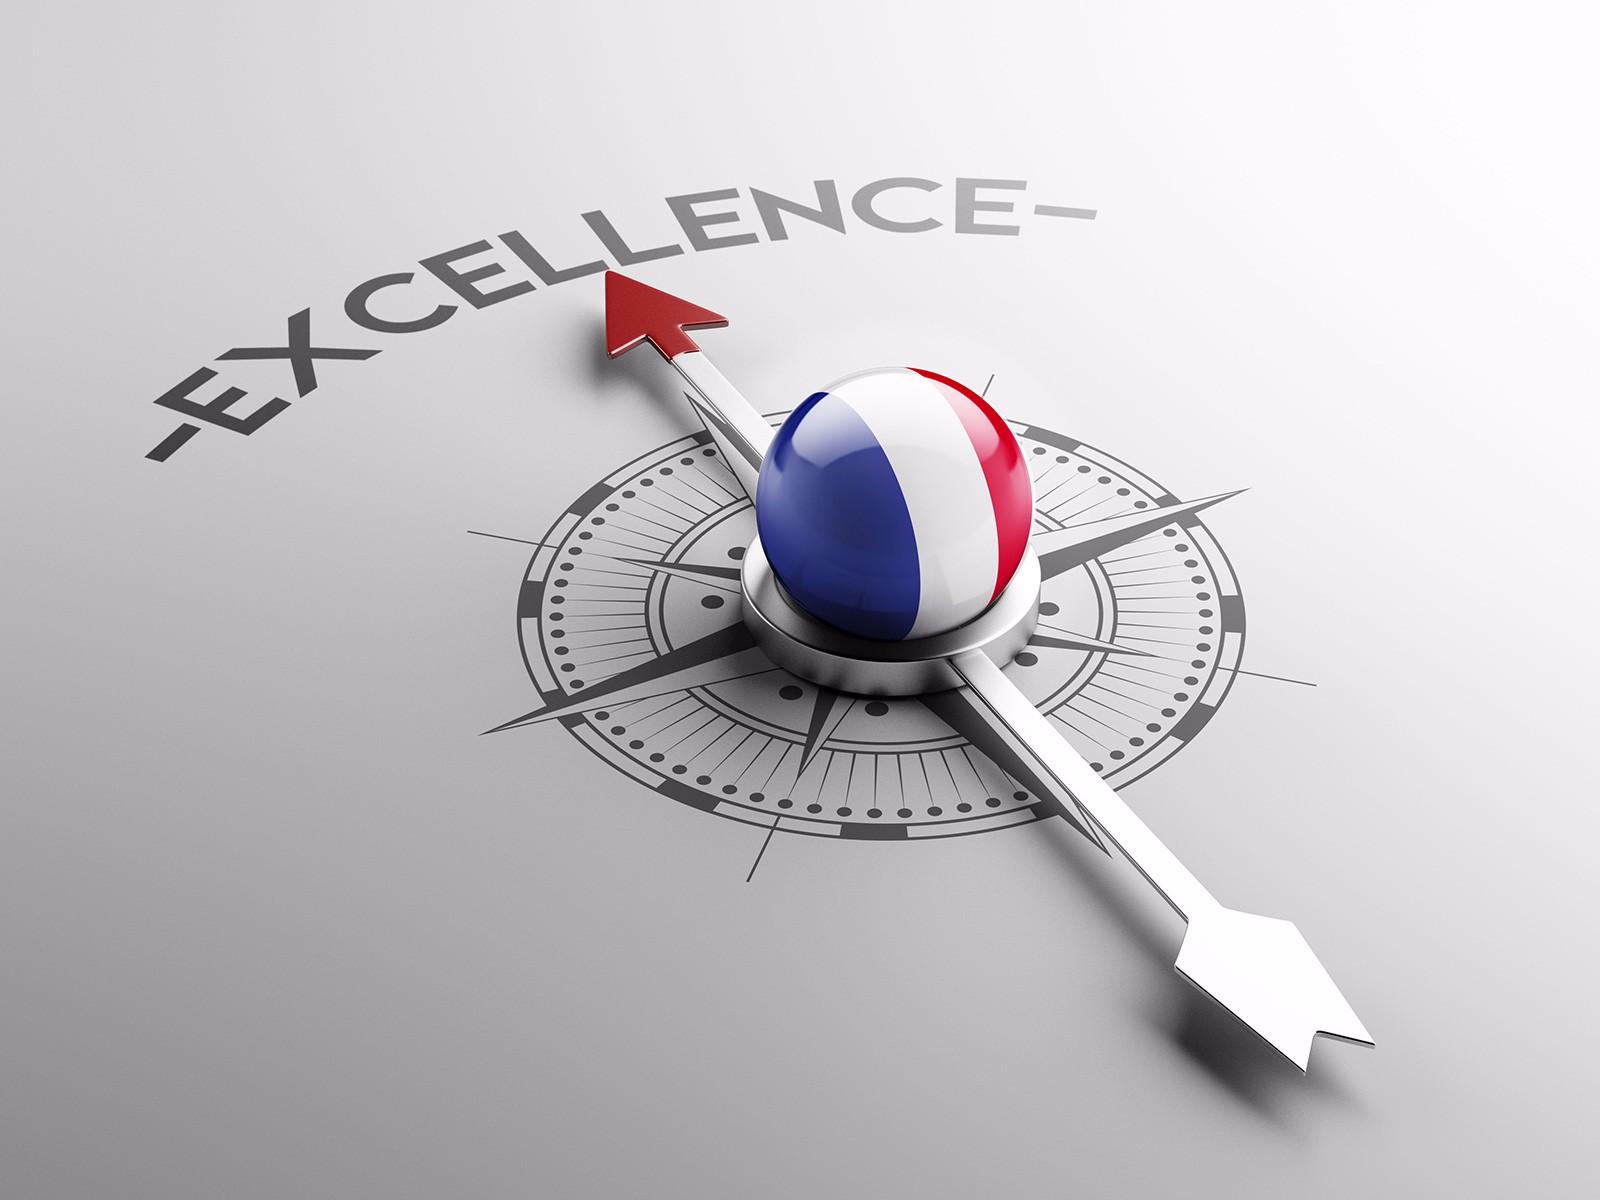 excelence-IOSFRANCE